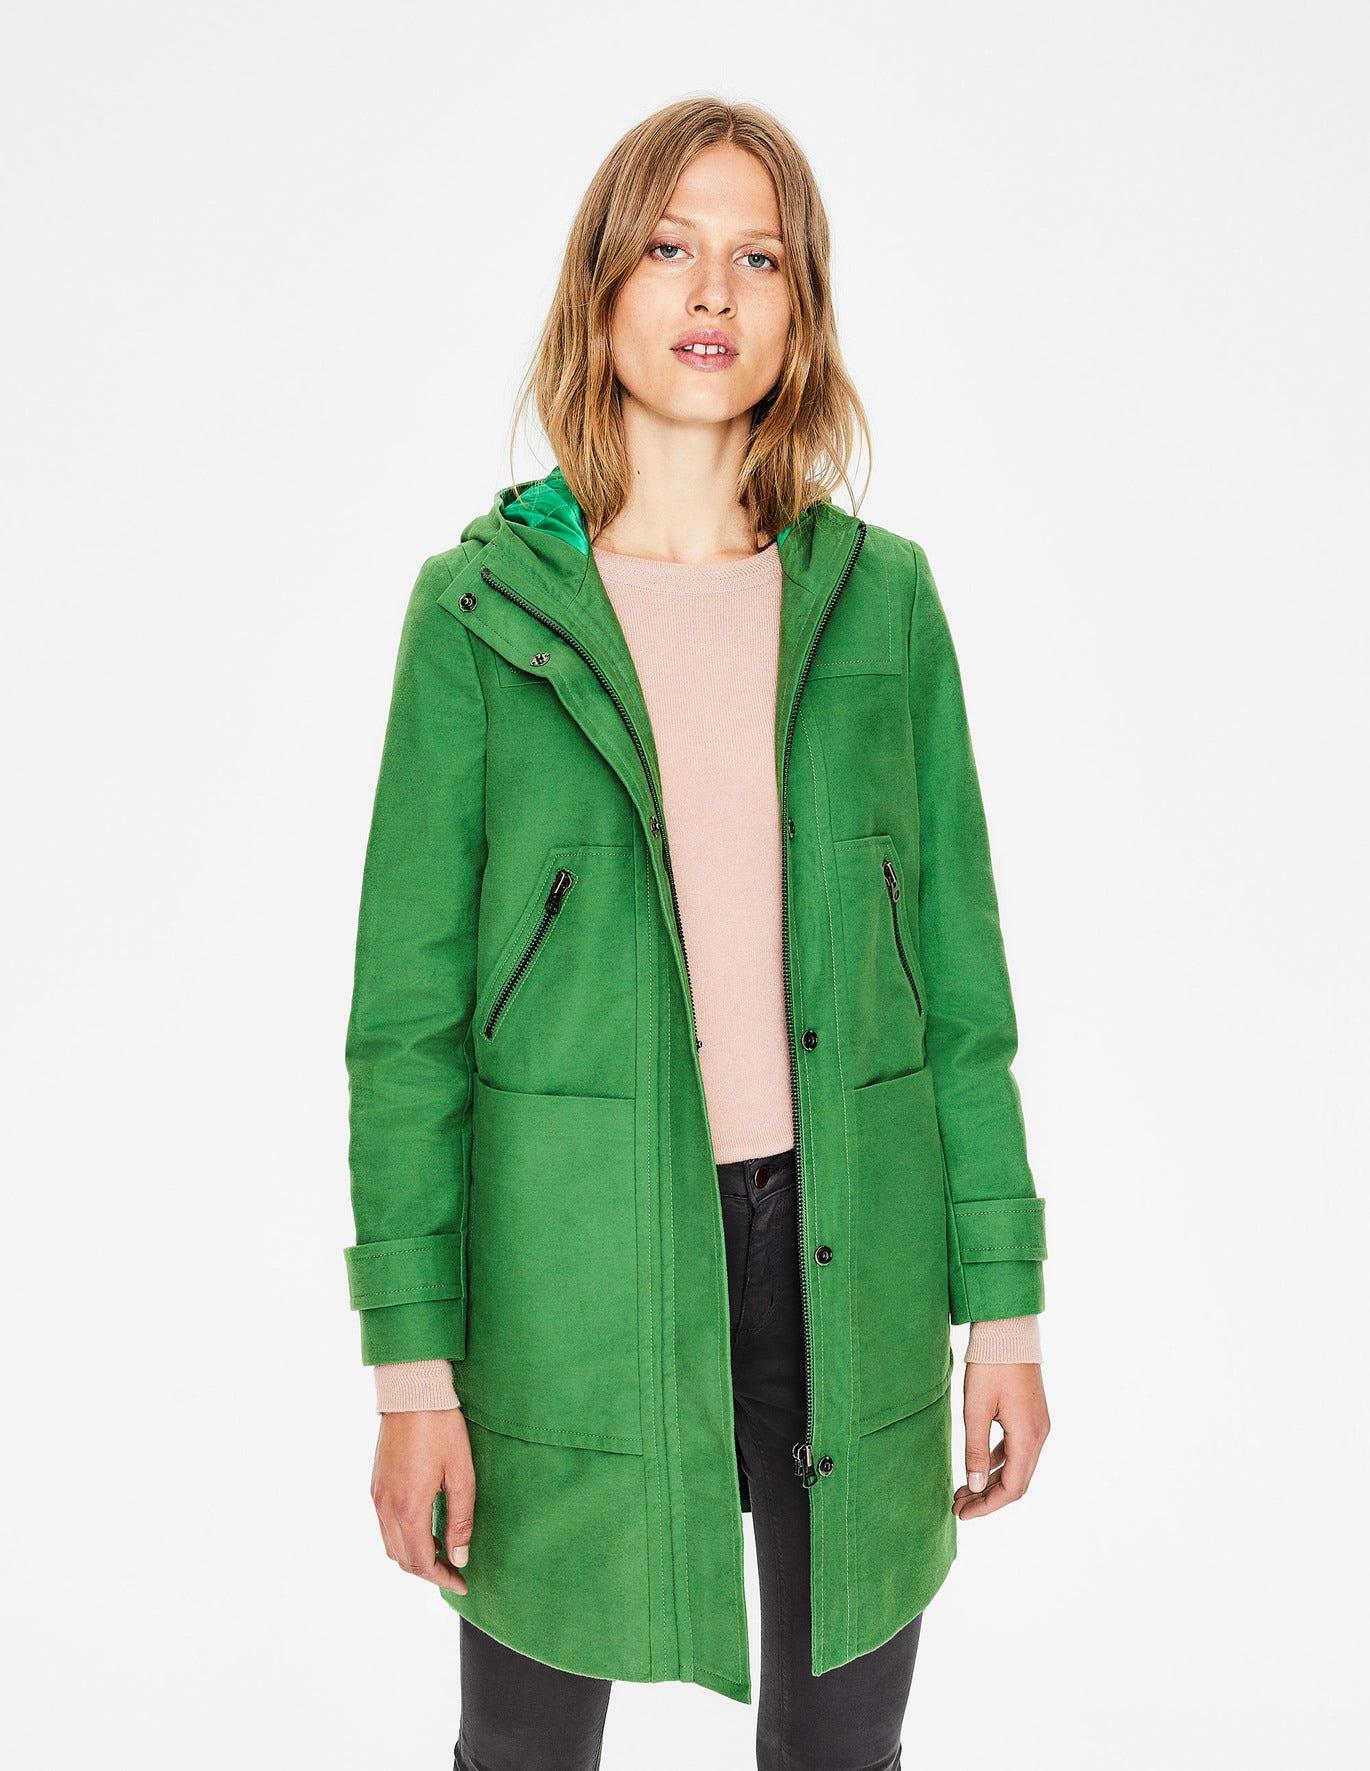 fe79635201f2 Moleskin Duffle Coat - Rich Green